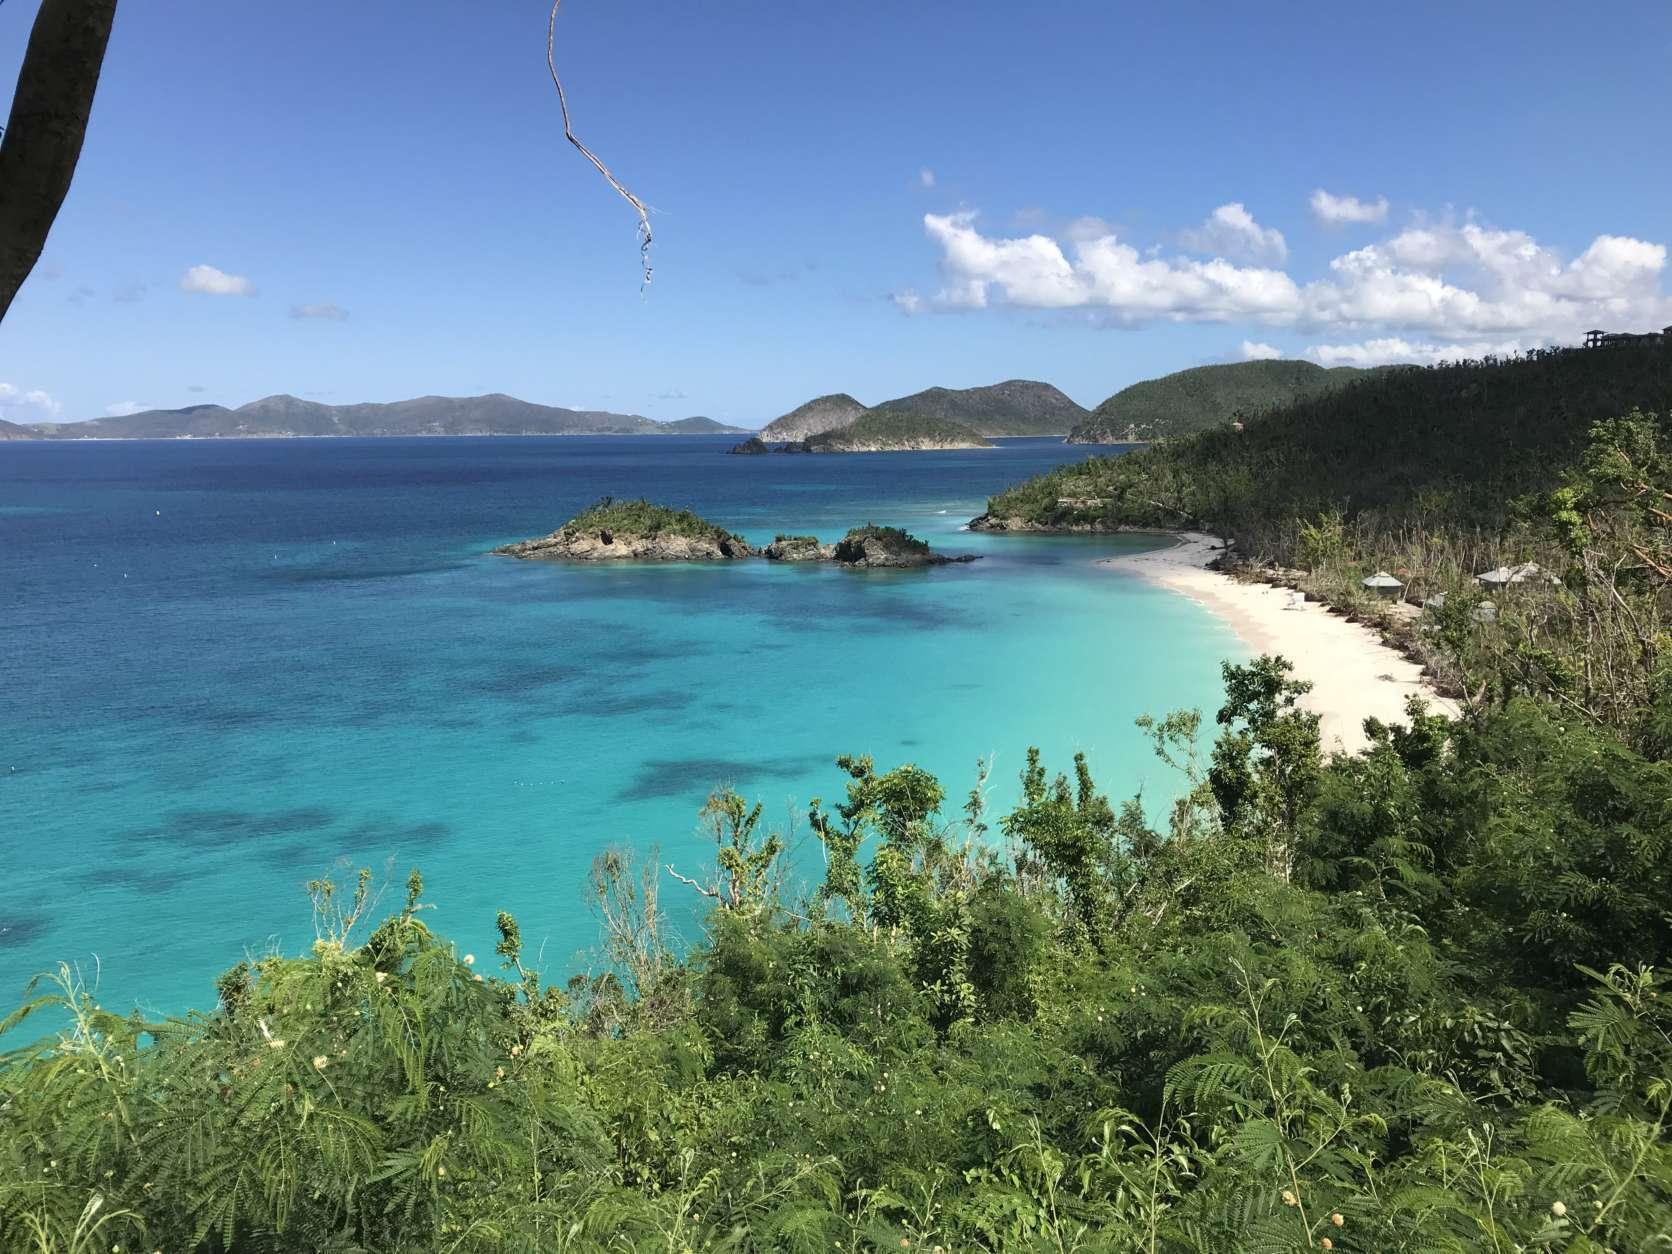 The beach at Trunk Bay, St. John, U.S. Virgin Islands. (WTOP/Jeff Clabaugh)